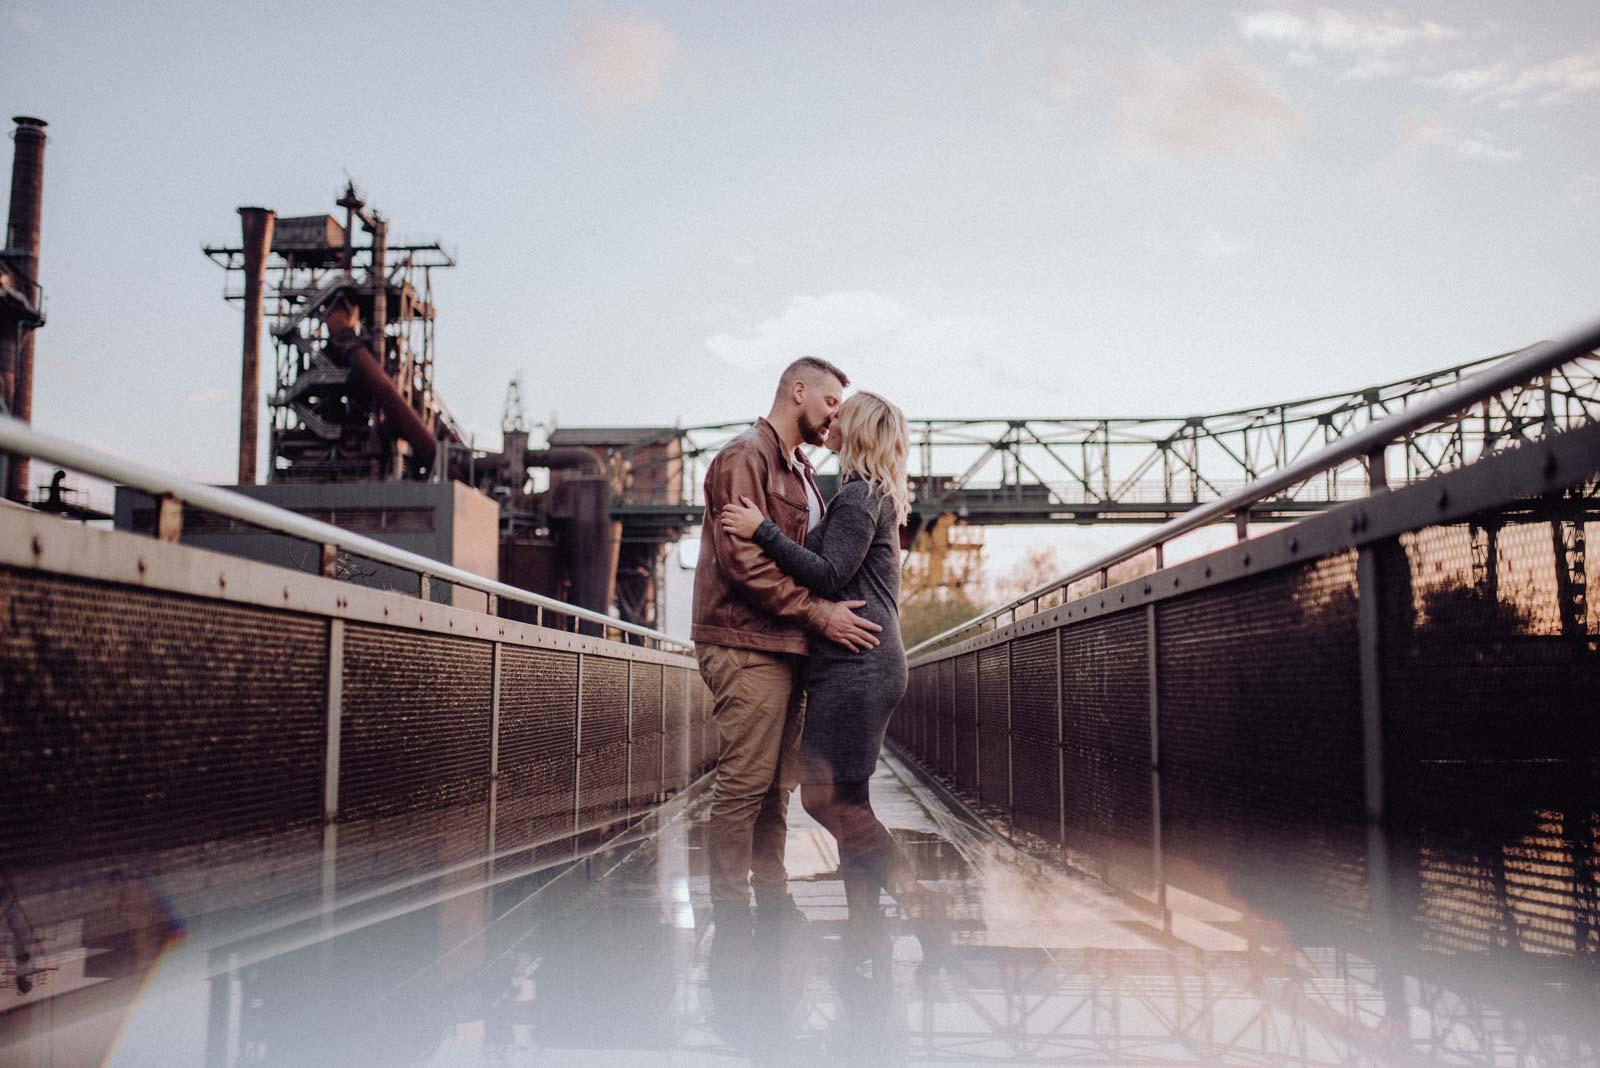 036-Babybauch-Shooting-Paarshooting-LaPaDu-Fotograf-Ruhrgebiet-Industriegebiet